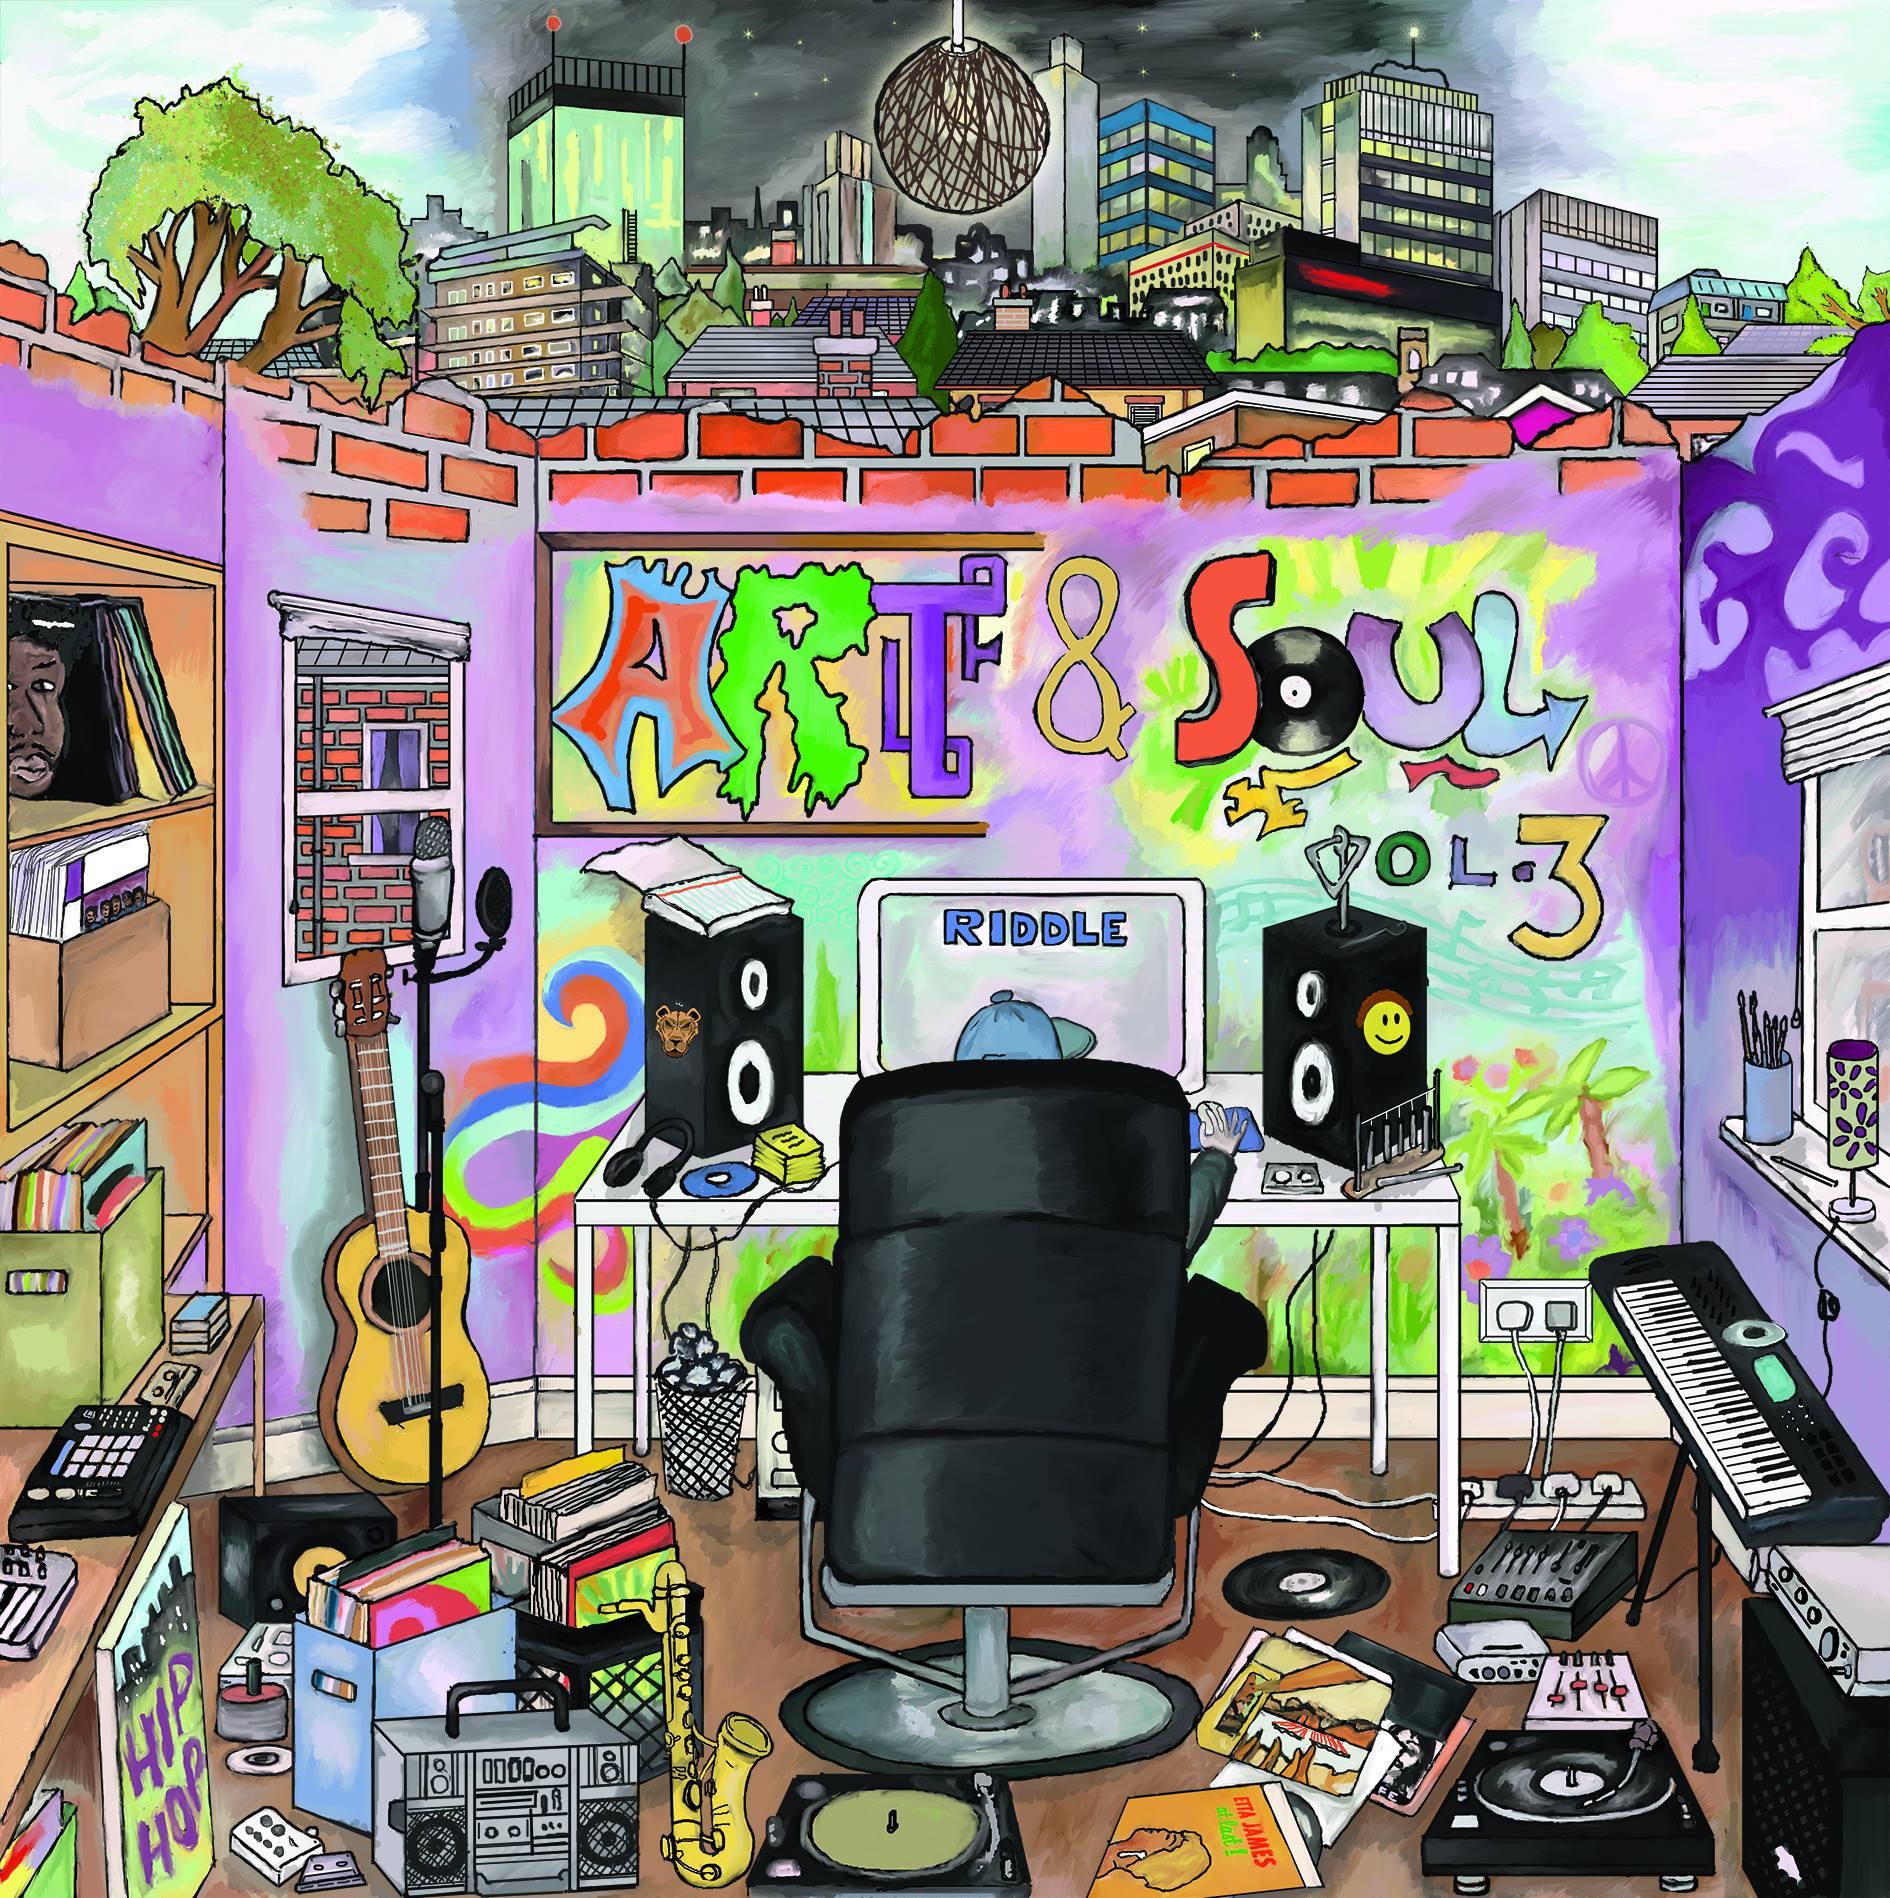 - ART & SOUL 3